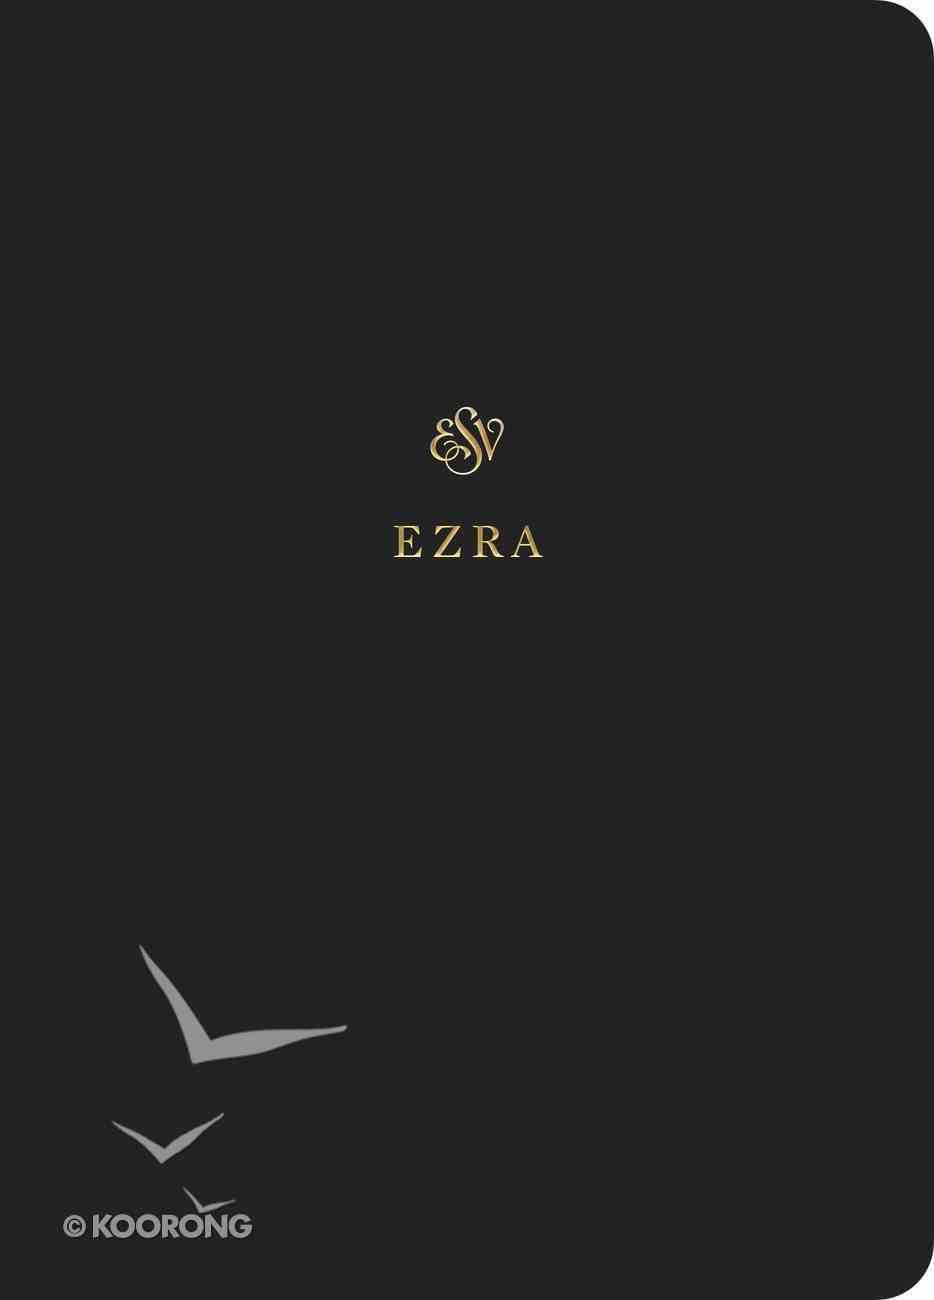 ESV Scripture Journal Ezra Paperback